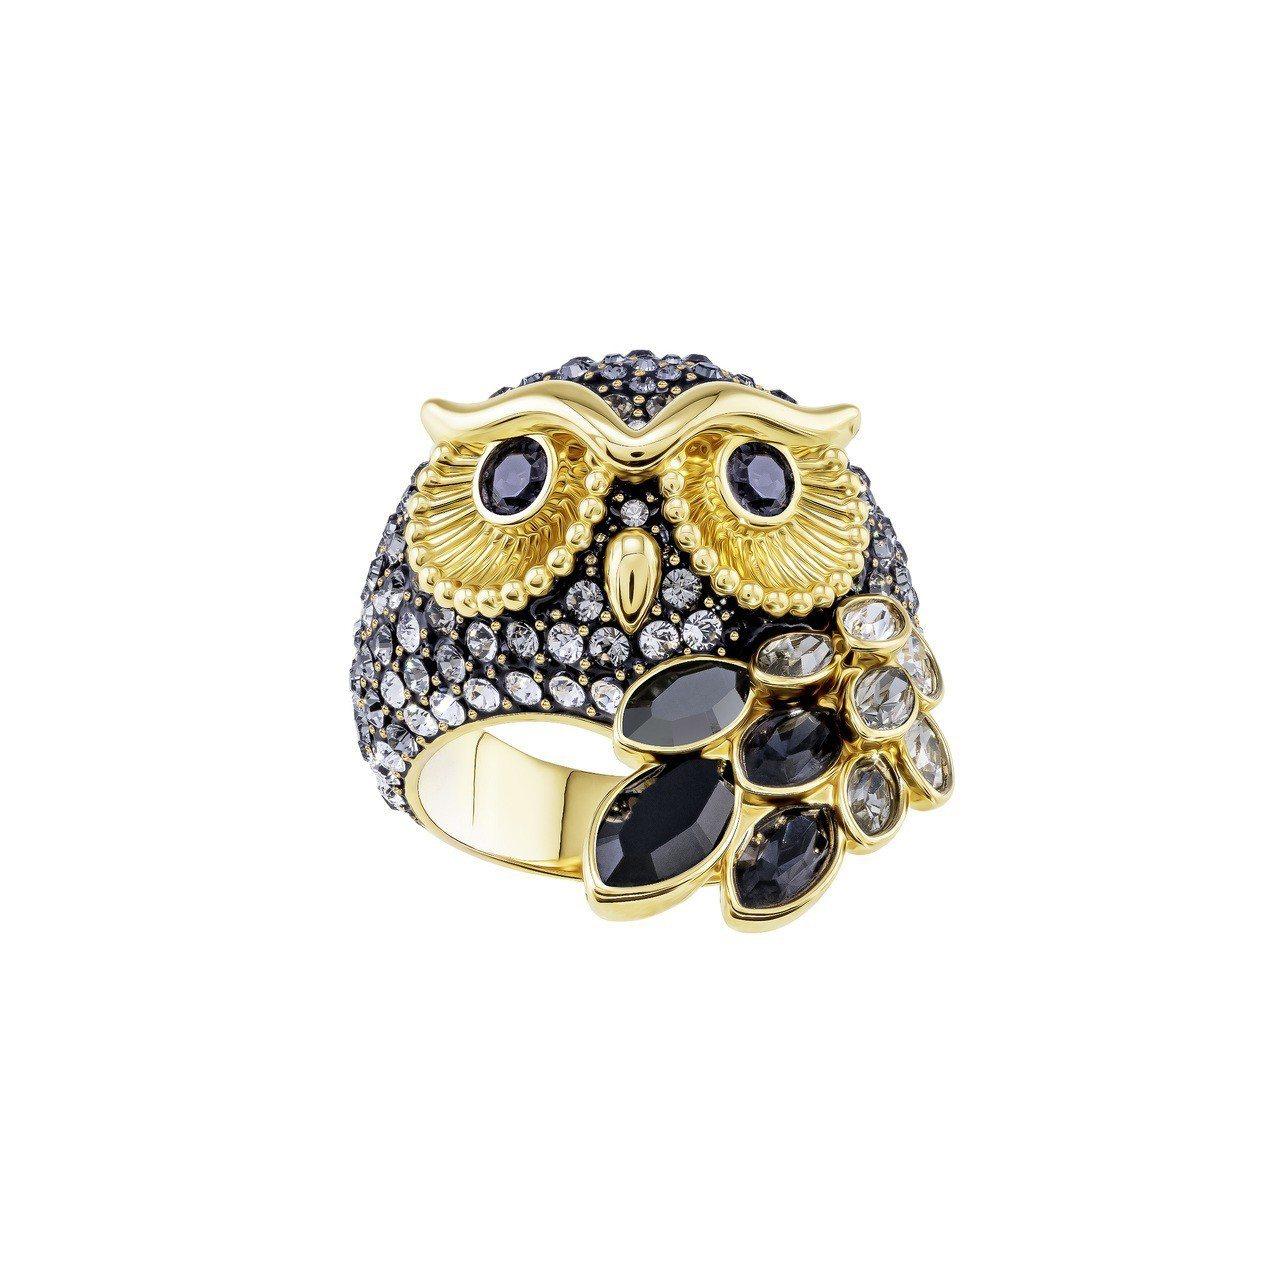 March 戒指,7,990元。圖/施華洛世奇提供